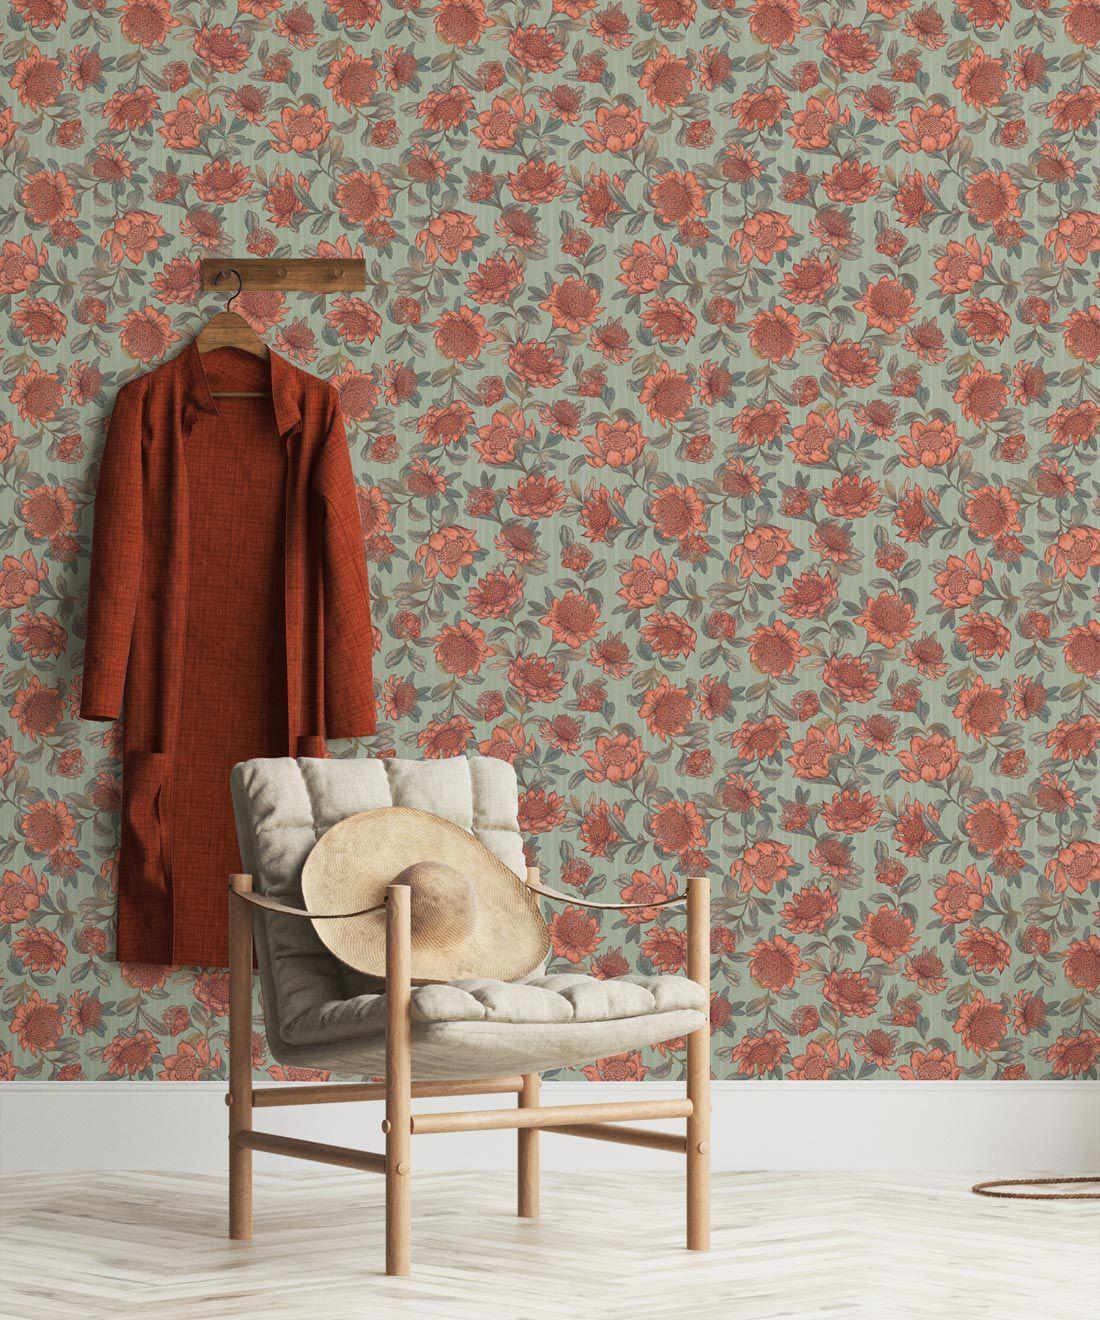 Waratah Wallpaper • Eloise Short • Vintage Floral Wallpaper •Granny Chic Wallpaper • Grandmillennial Style Wallpaper •Green •Insitu